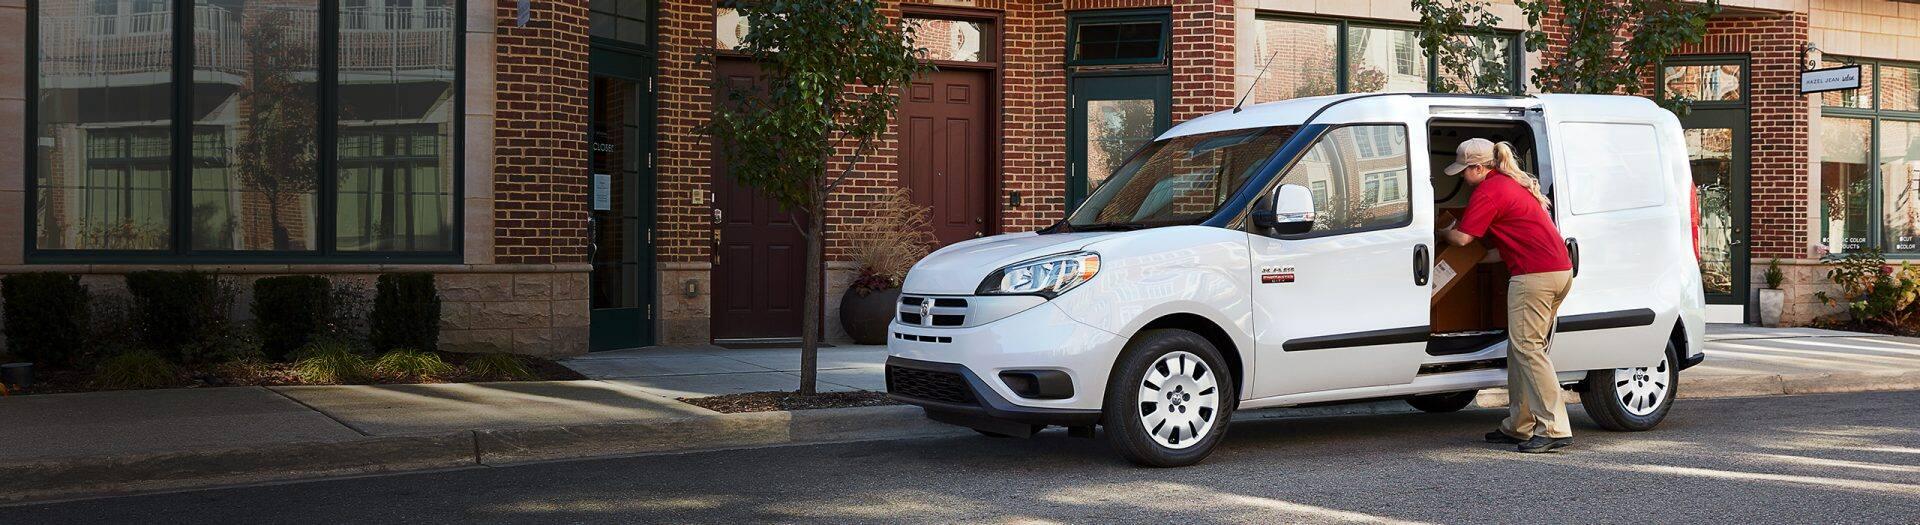 2018 ram trucks promaster city efficient cargo van. Black Bedroom Furniture Sets. Home Design Ideas